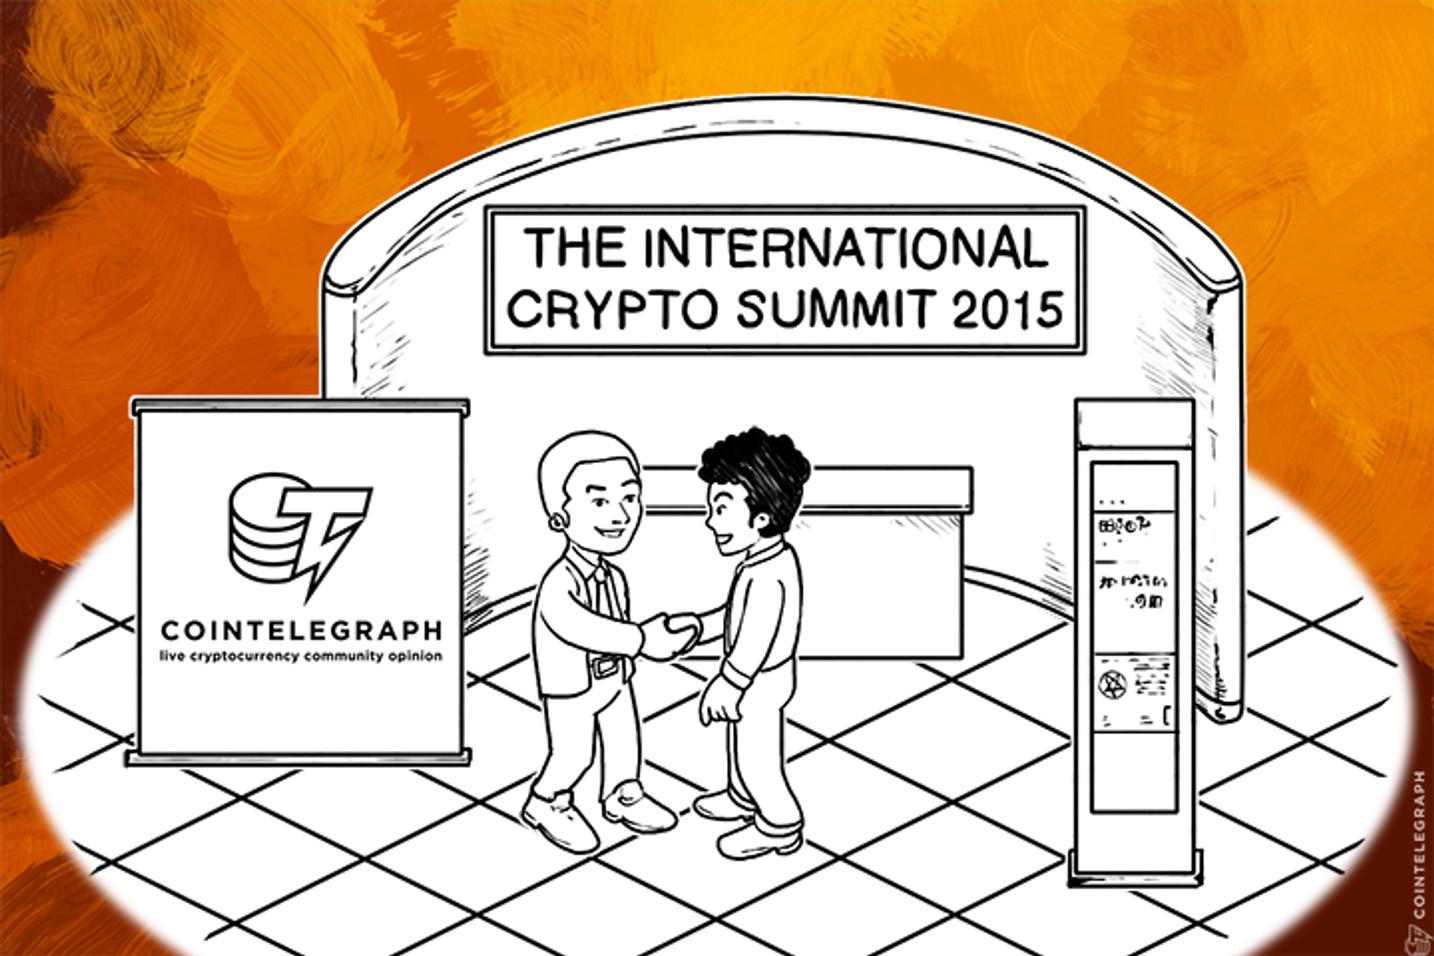 2015 International Virtual Crypto Summit announced